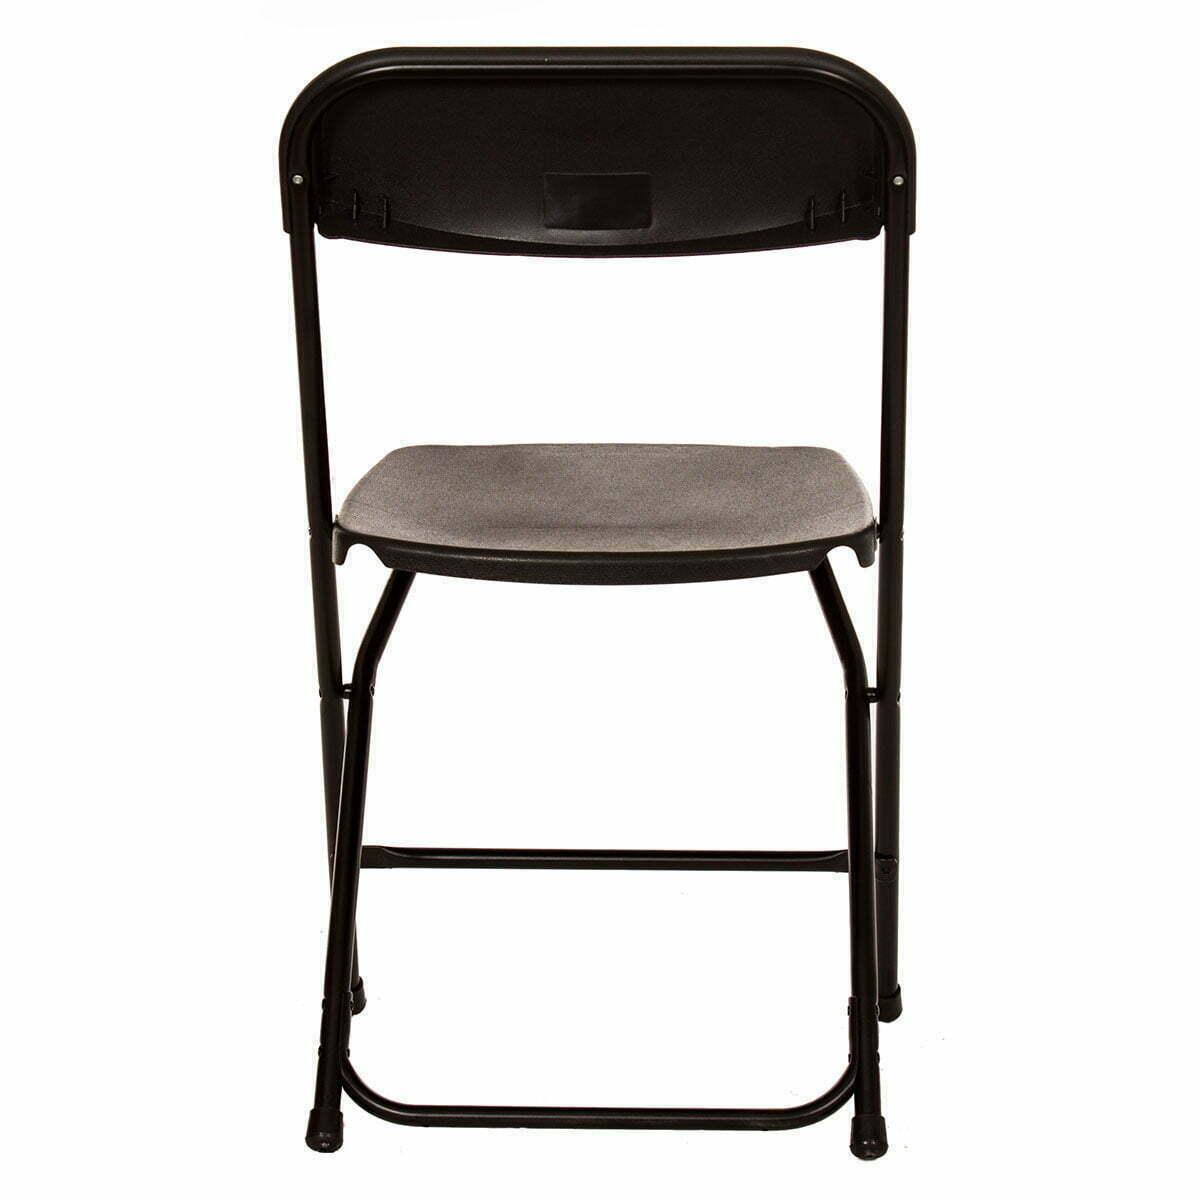 Plastic folding chair - Back